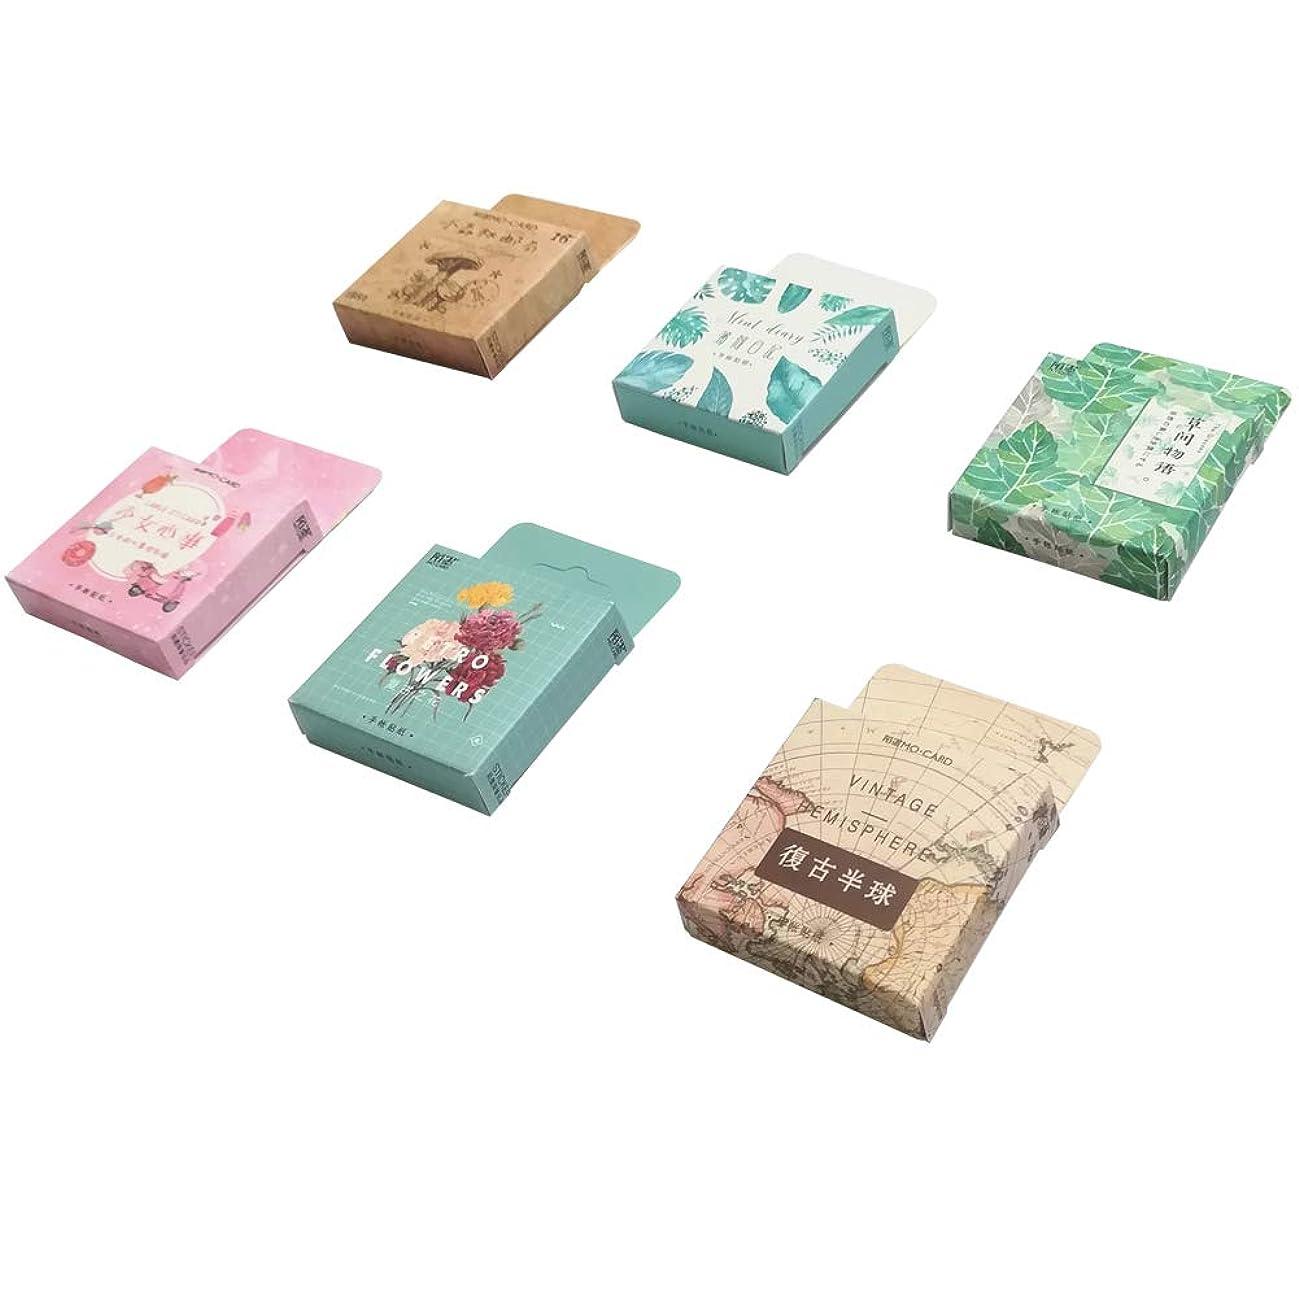 Paper Stationery Sticker Set (6 Box, 270 Pieces) Fresh Mint Leaf Tropical Plants Leaves Vintage Flower Hemisphere Paper Decorative Sticker Label for Art DIY Craft Scrapbooking Diary Planner Album